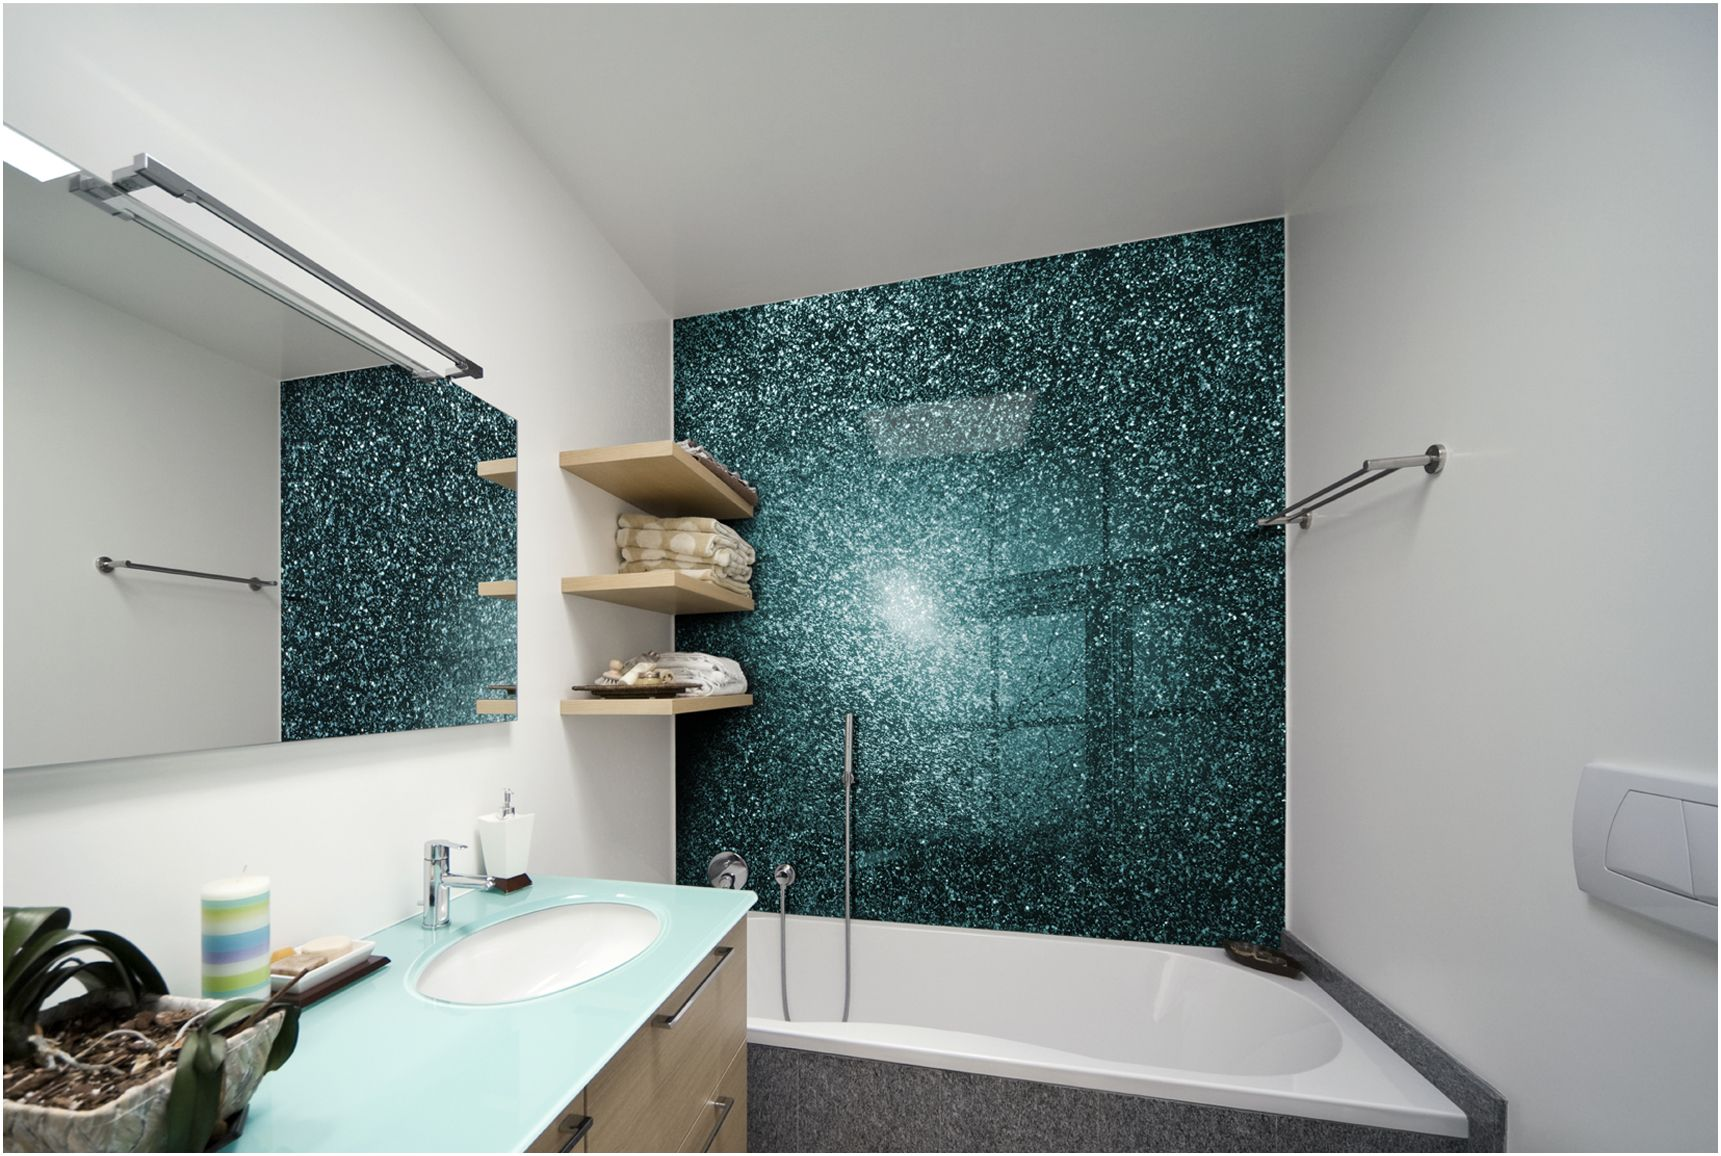 Pin by CreoGlass Design on Glass Splashbacks for Bathrooms ...